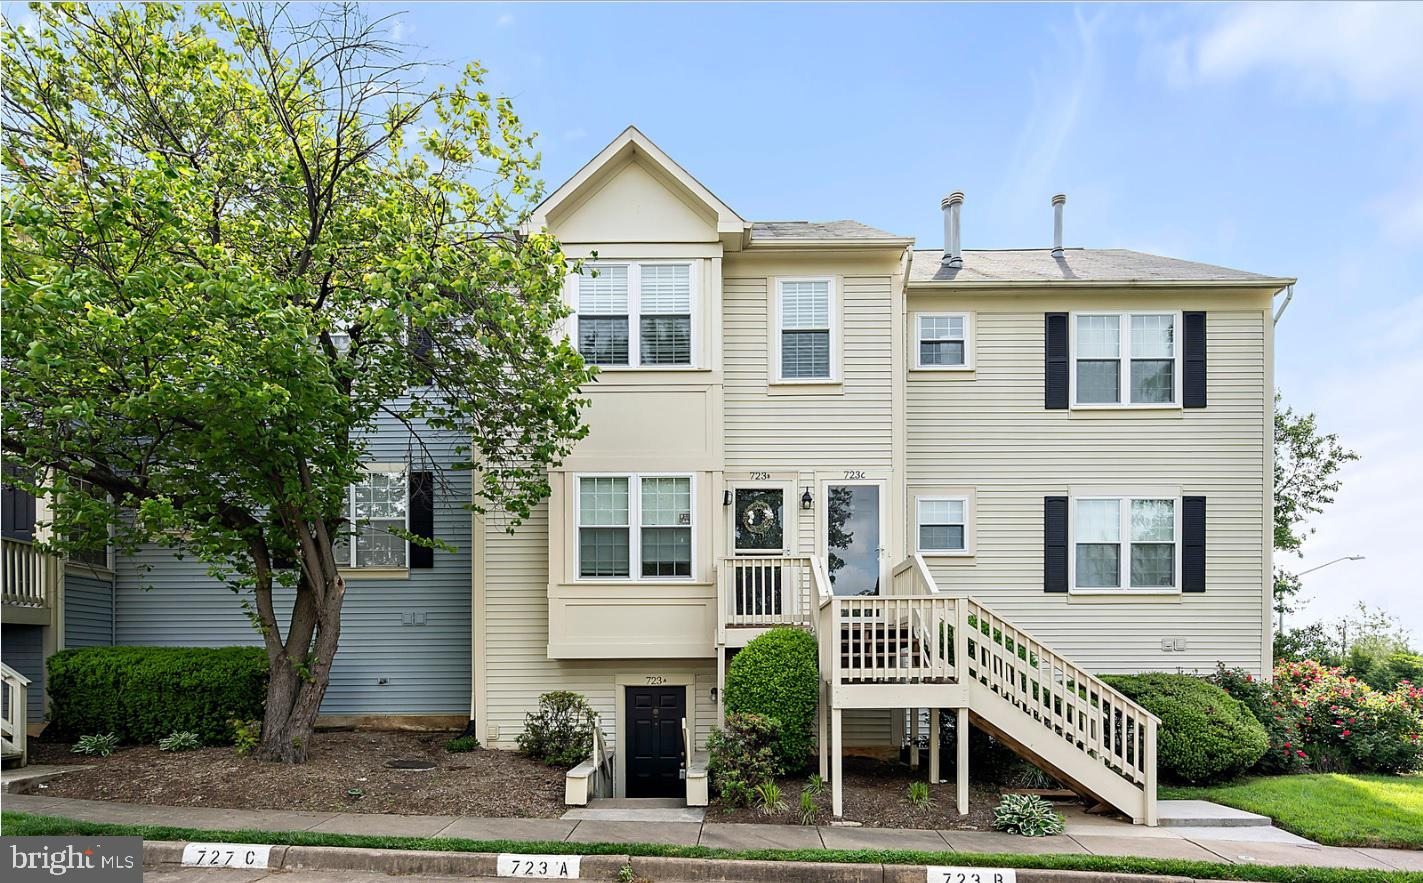 condominiums for Sale at 723 A Cedar Crest Dr #a Warrenton, Virginia 20186 United States